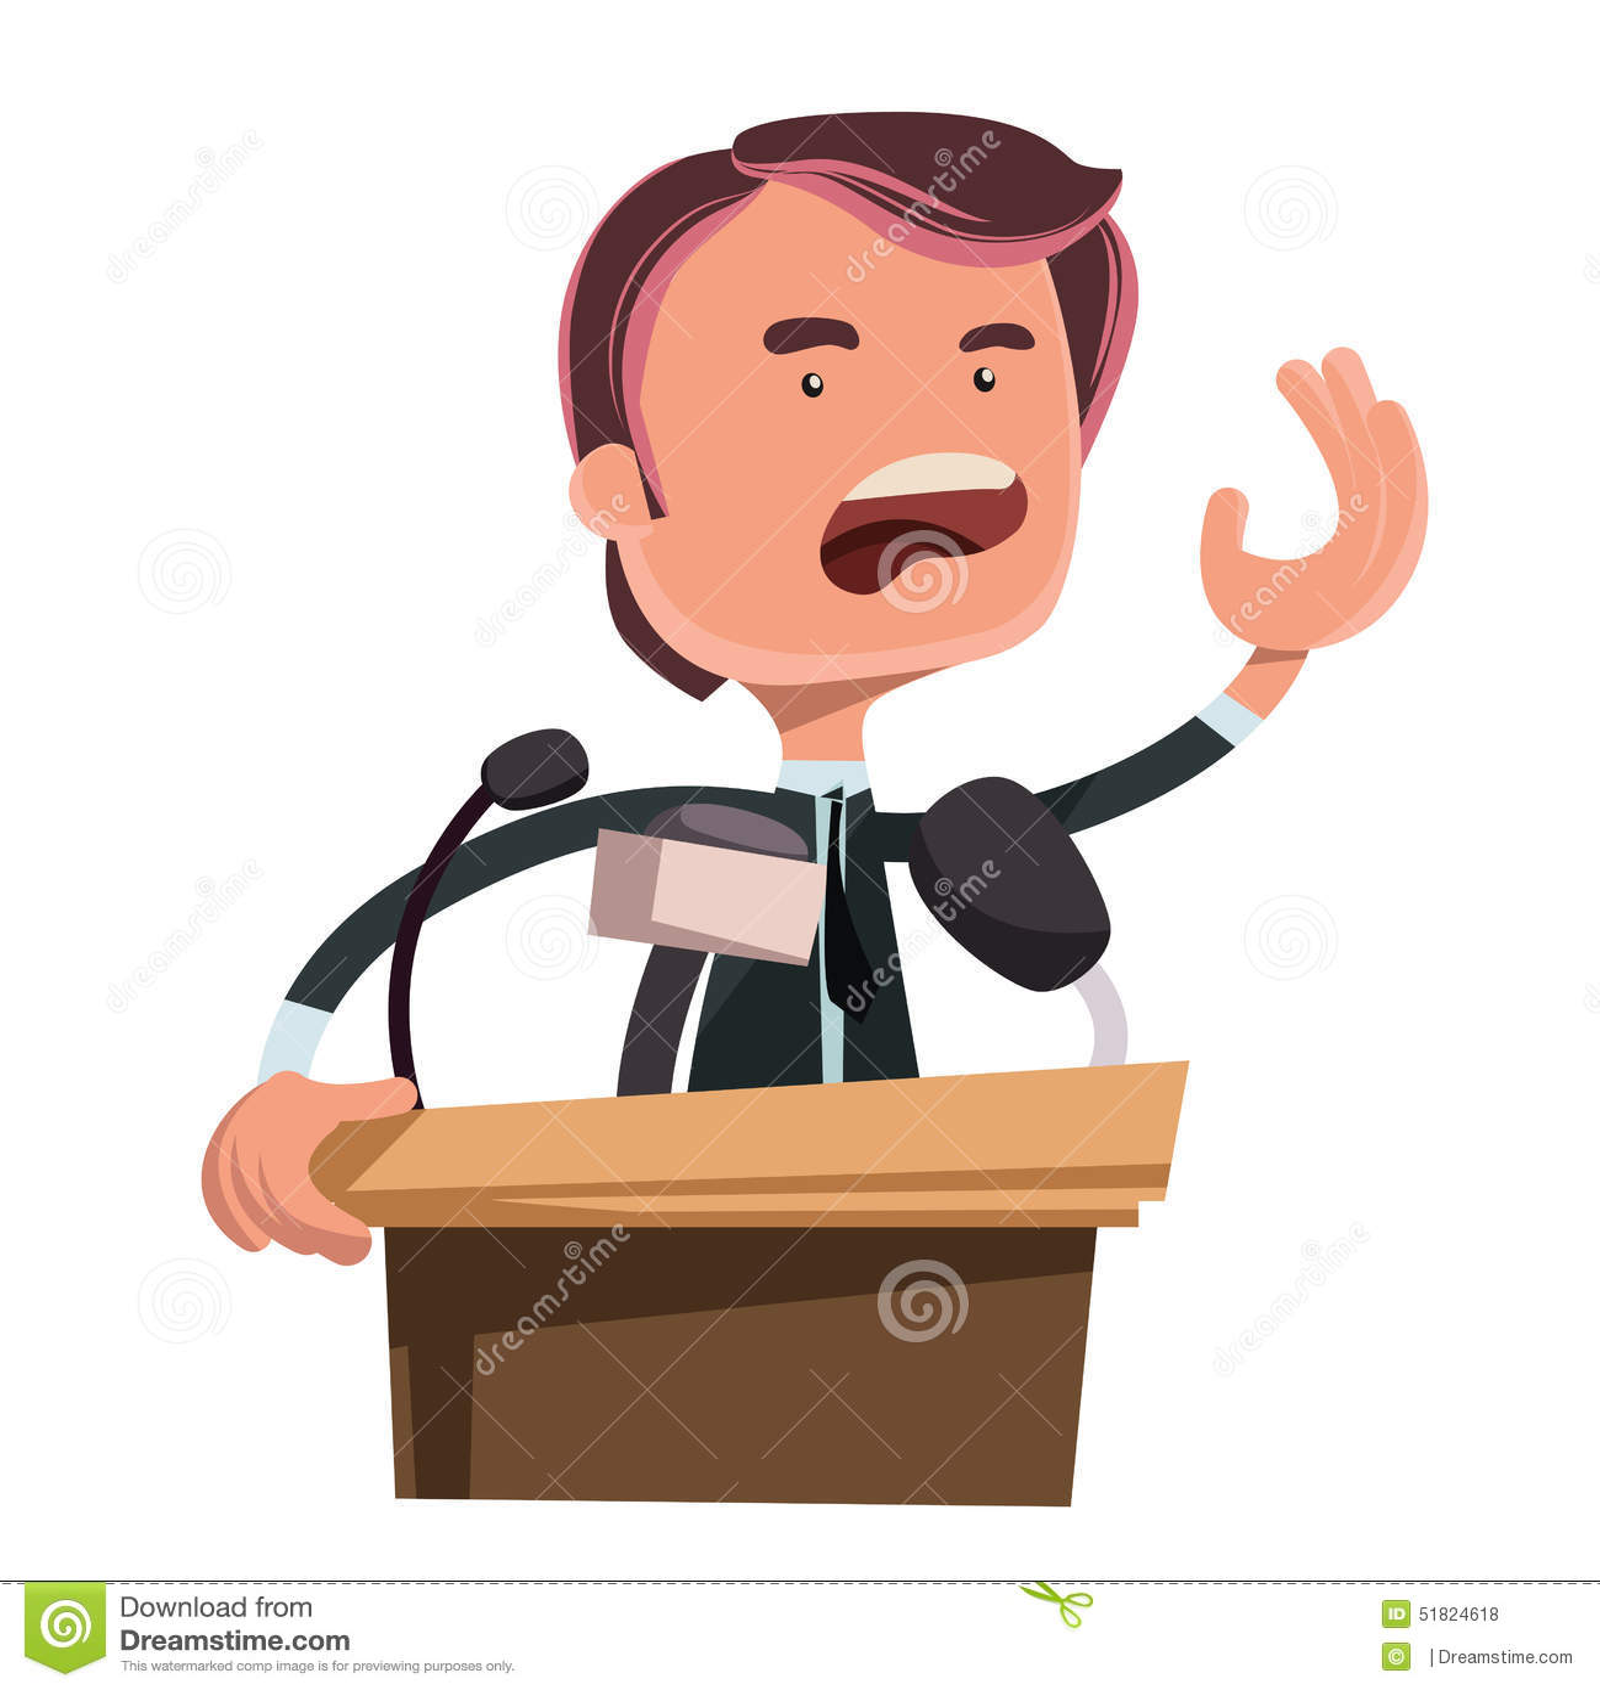 Politician giving speech illustration cartoon character. Enjoy :).